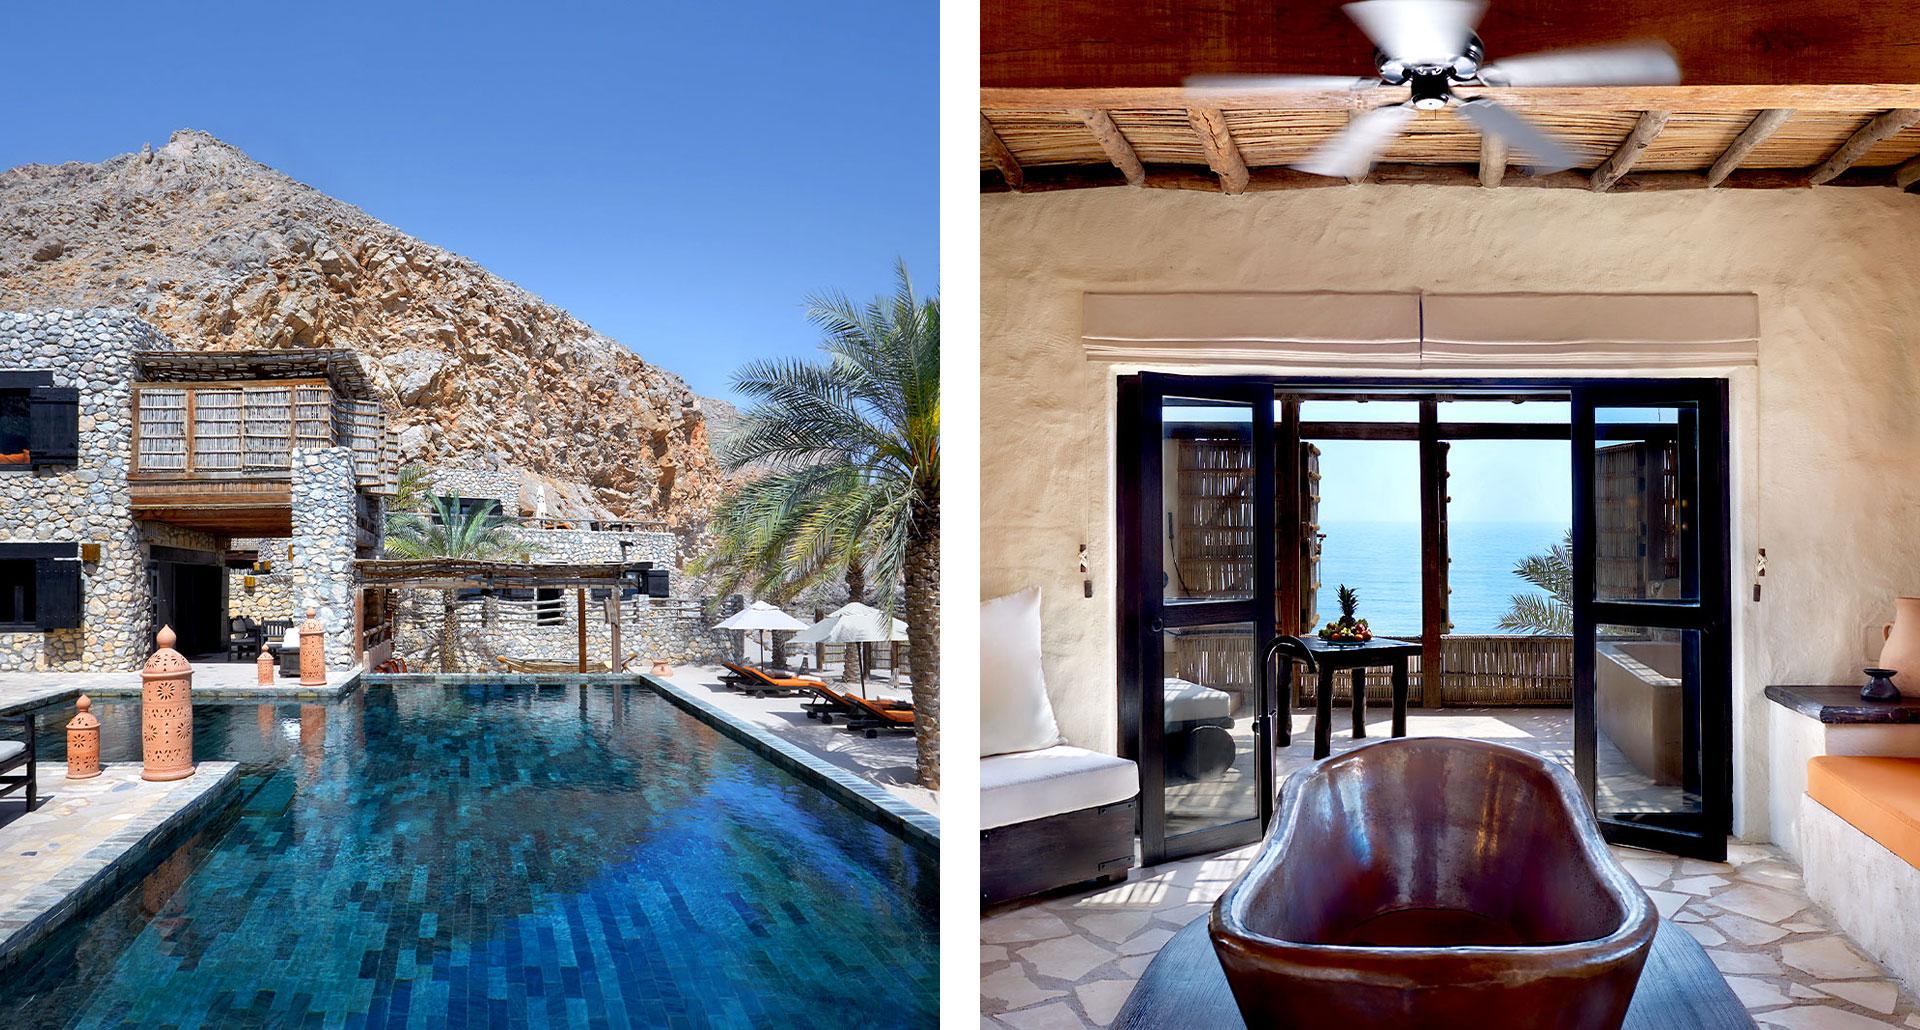 Six Senses Zighy Bay - boutique hotel in Oman